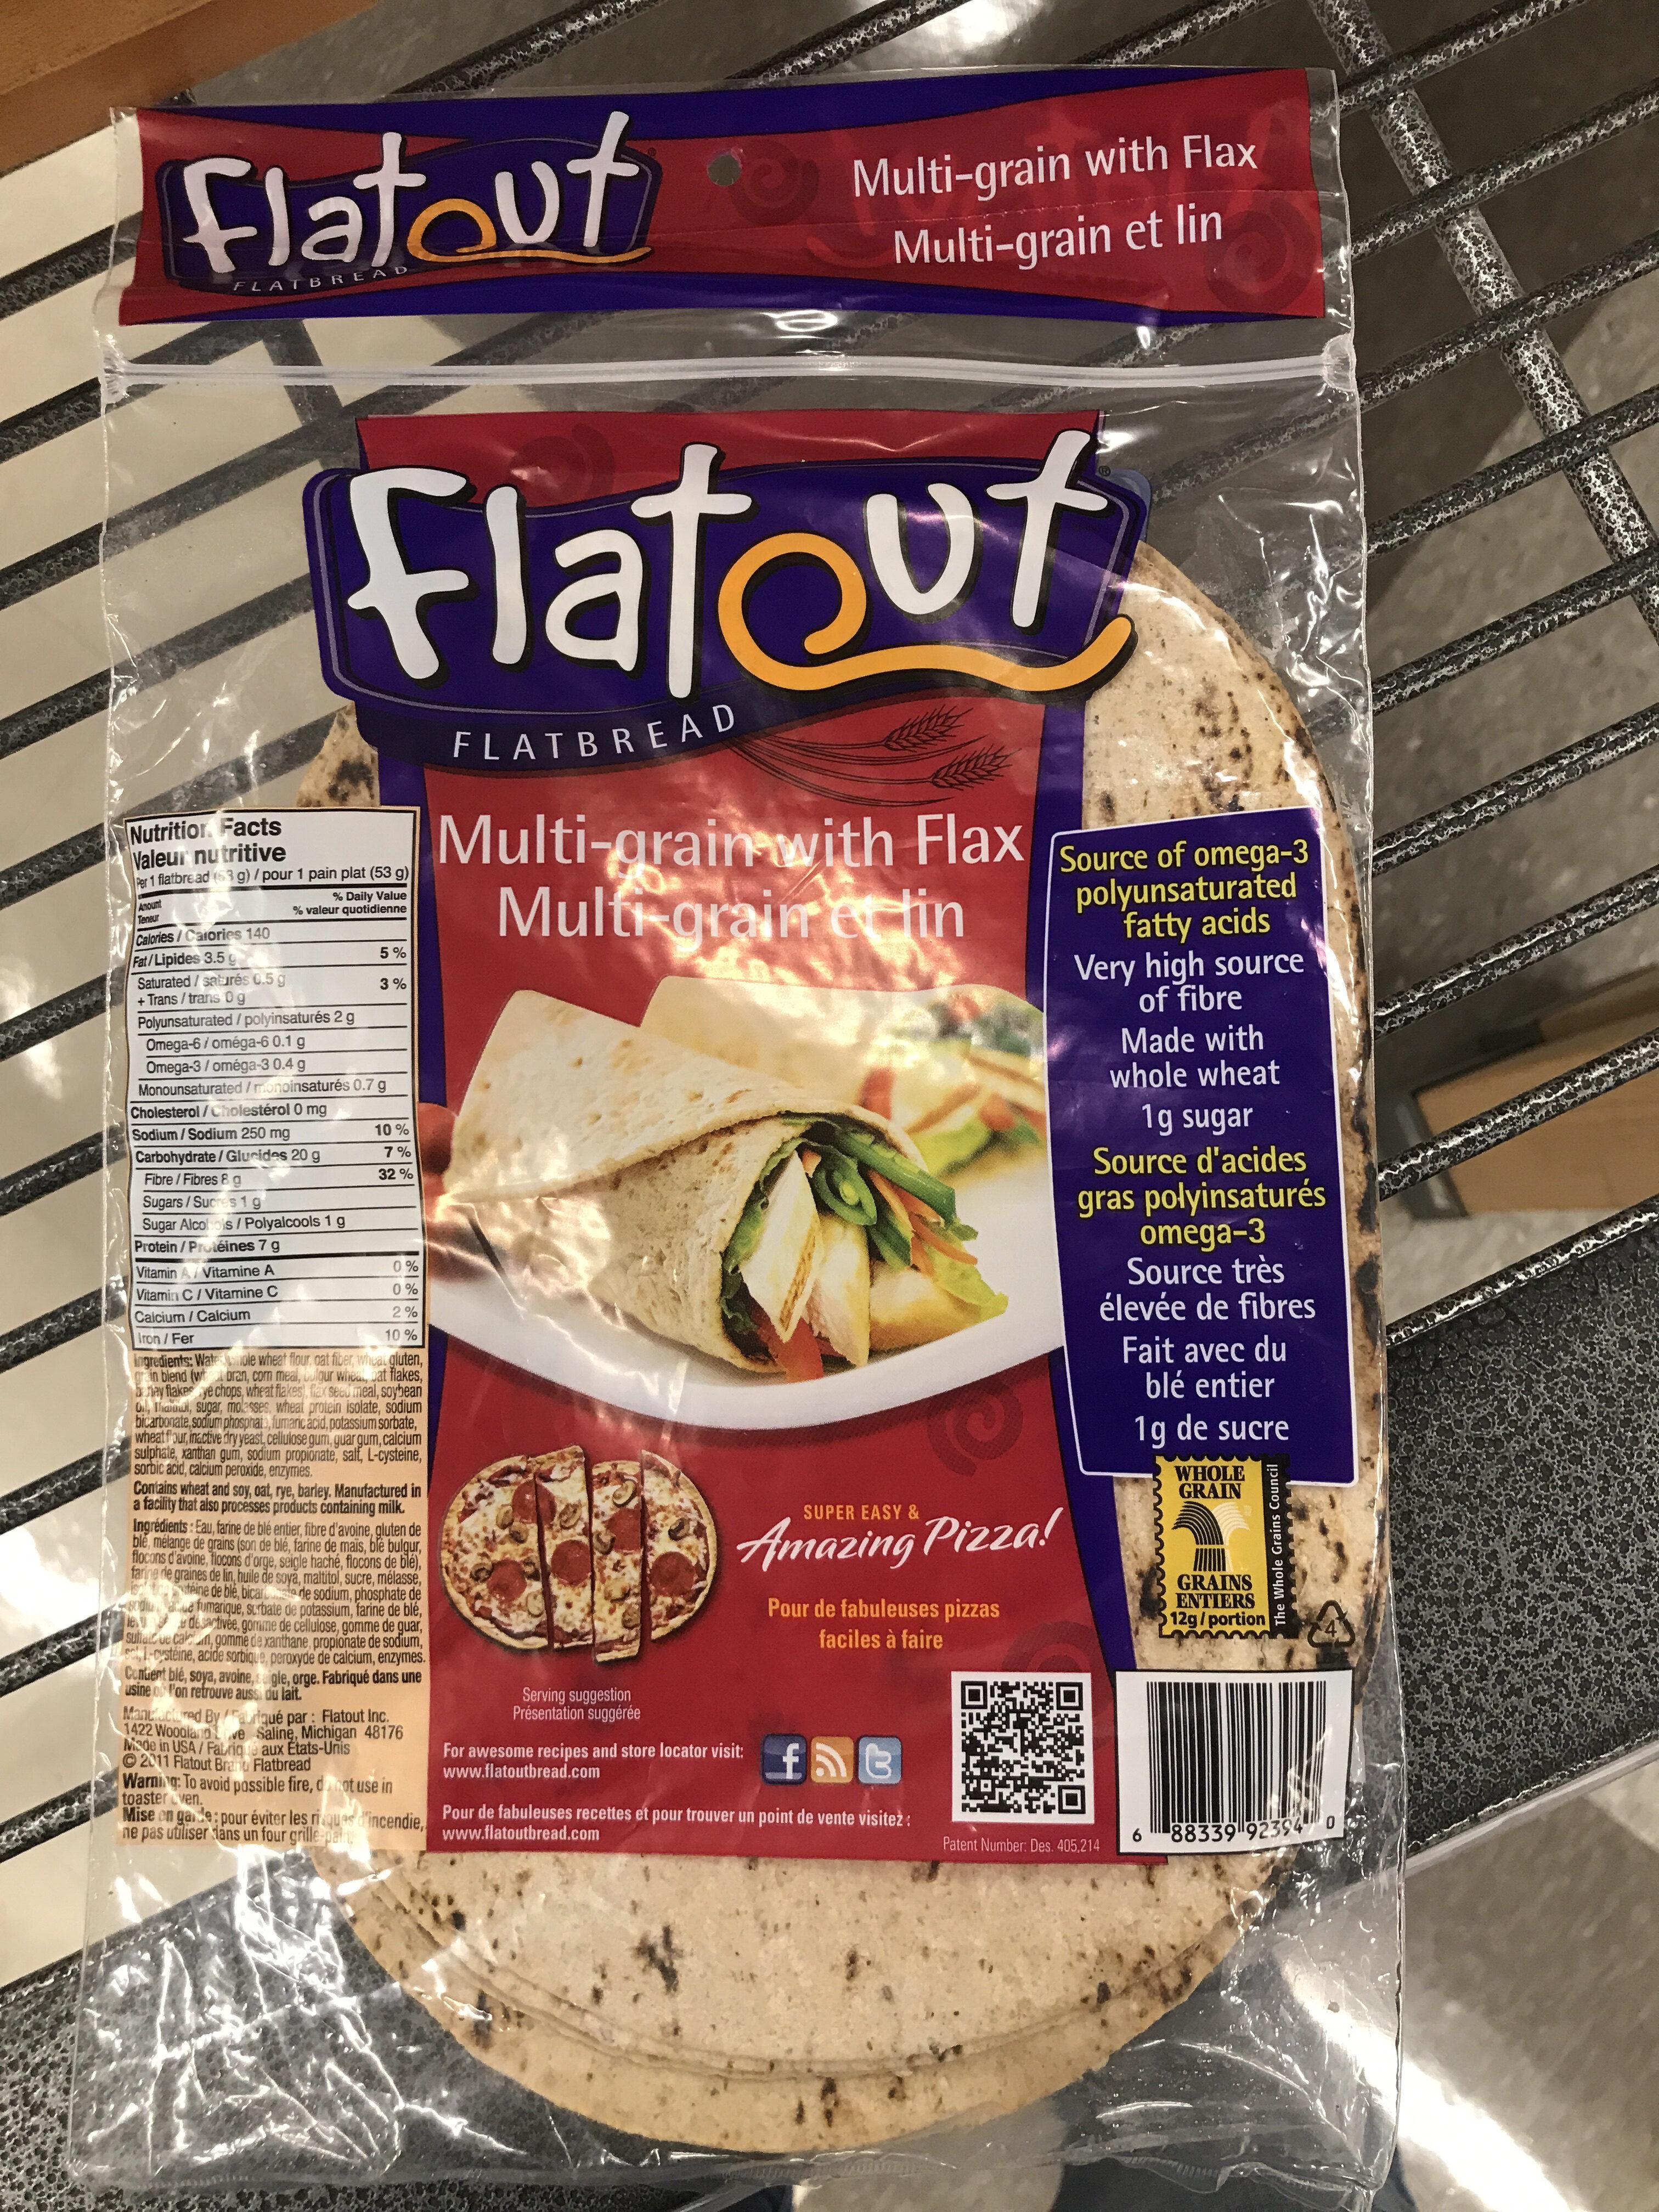 Flatout, Multigrain Flatbread With Flax - Product